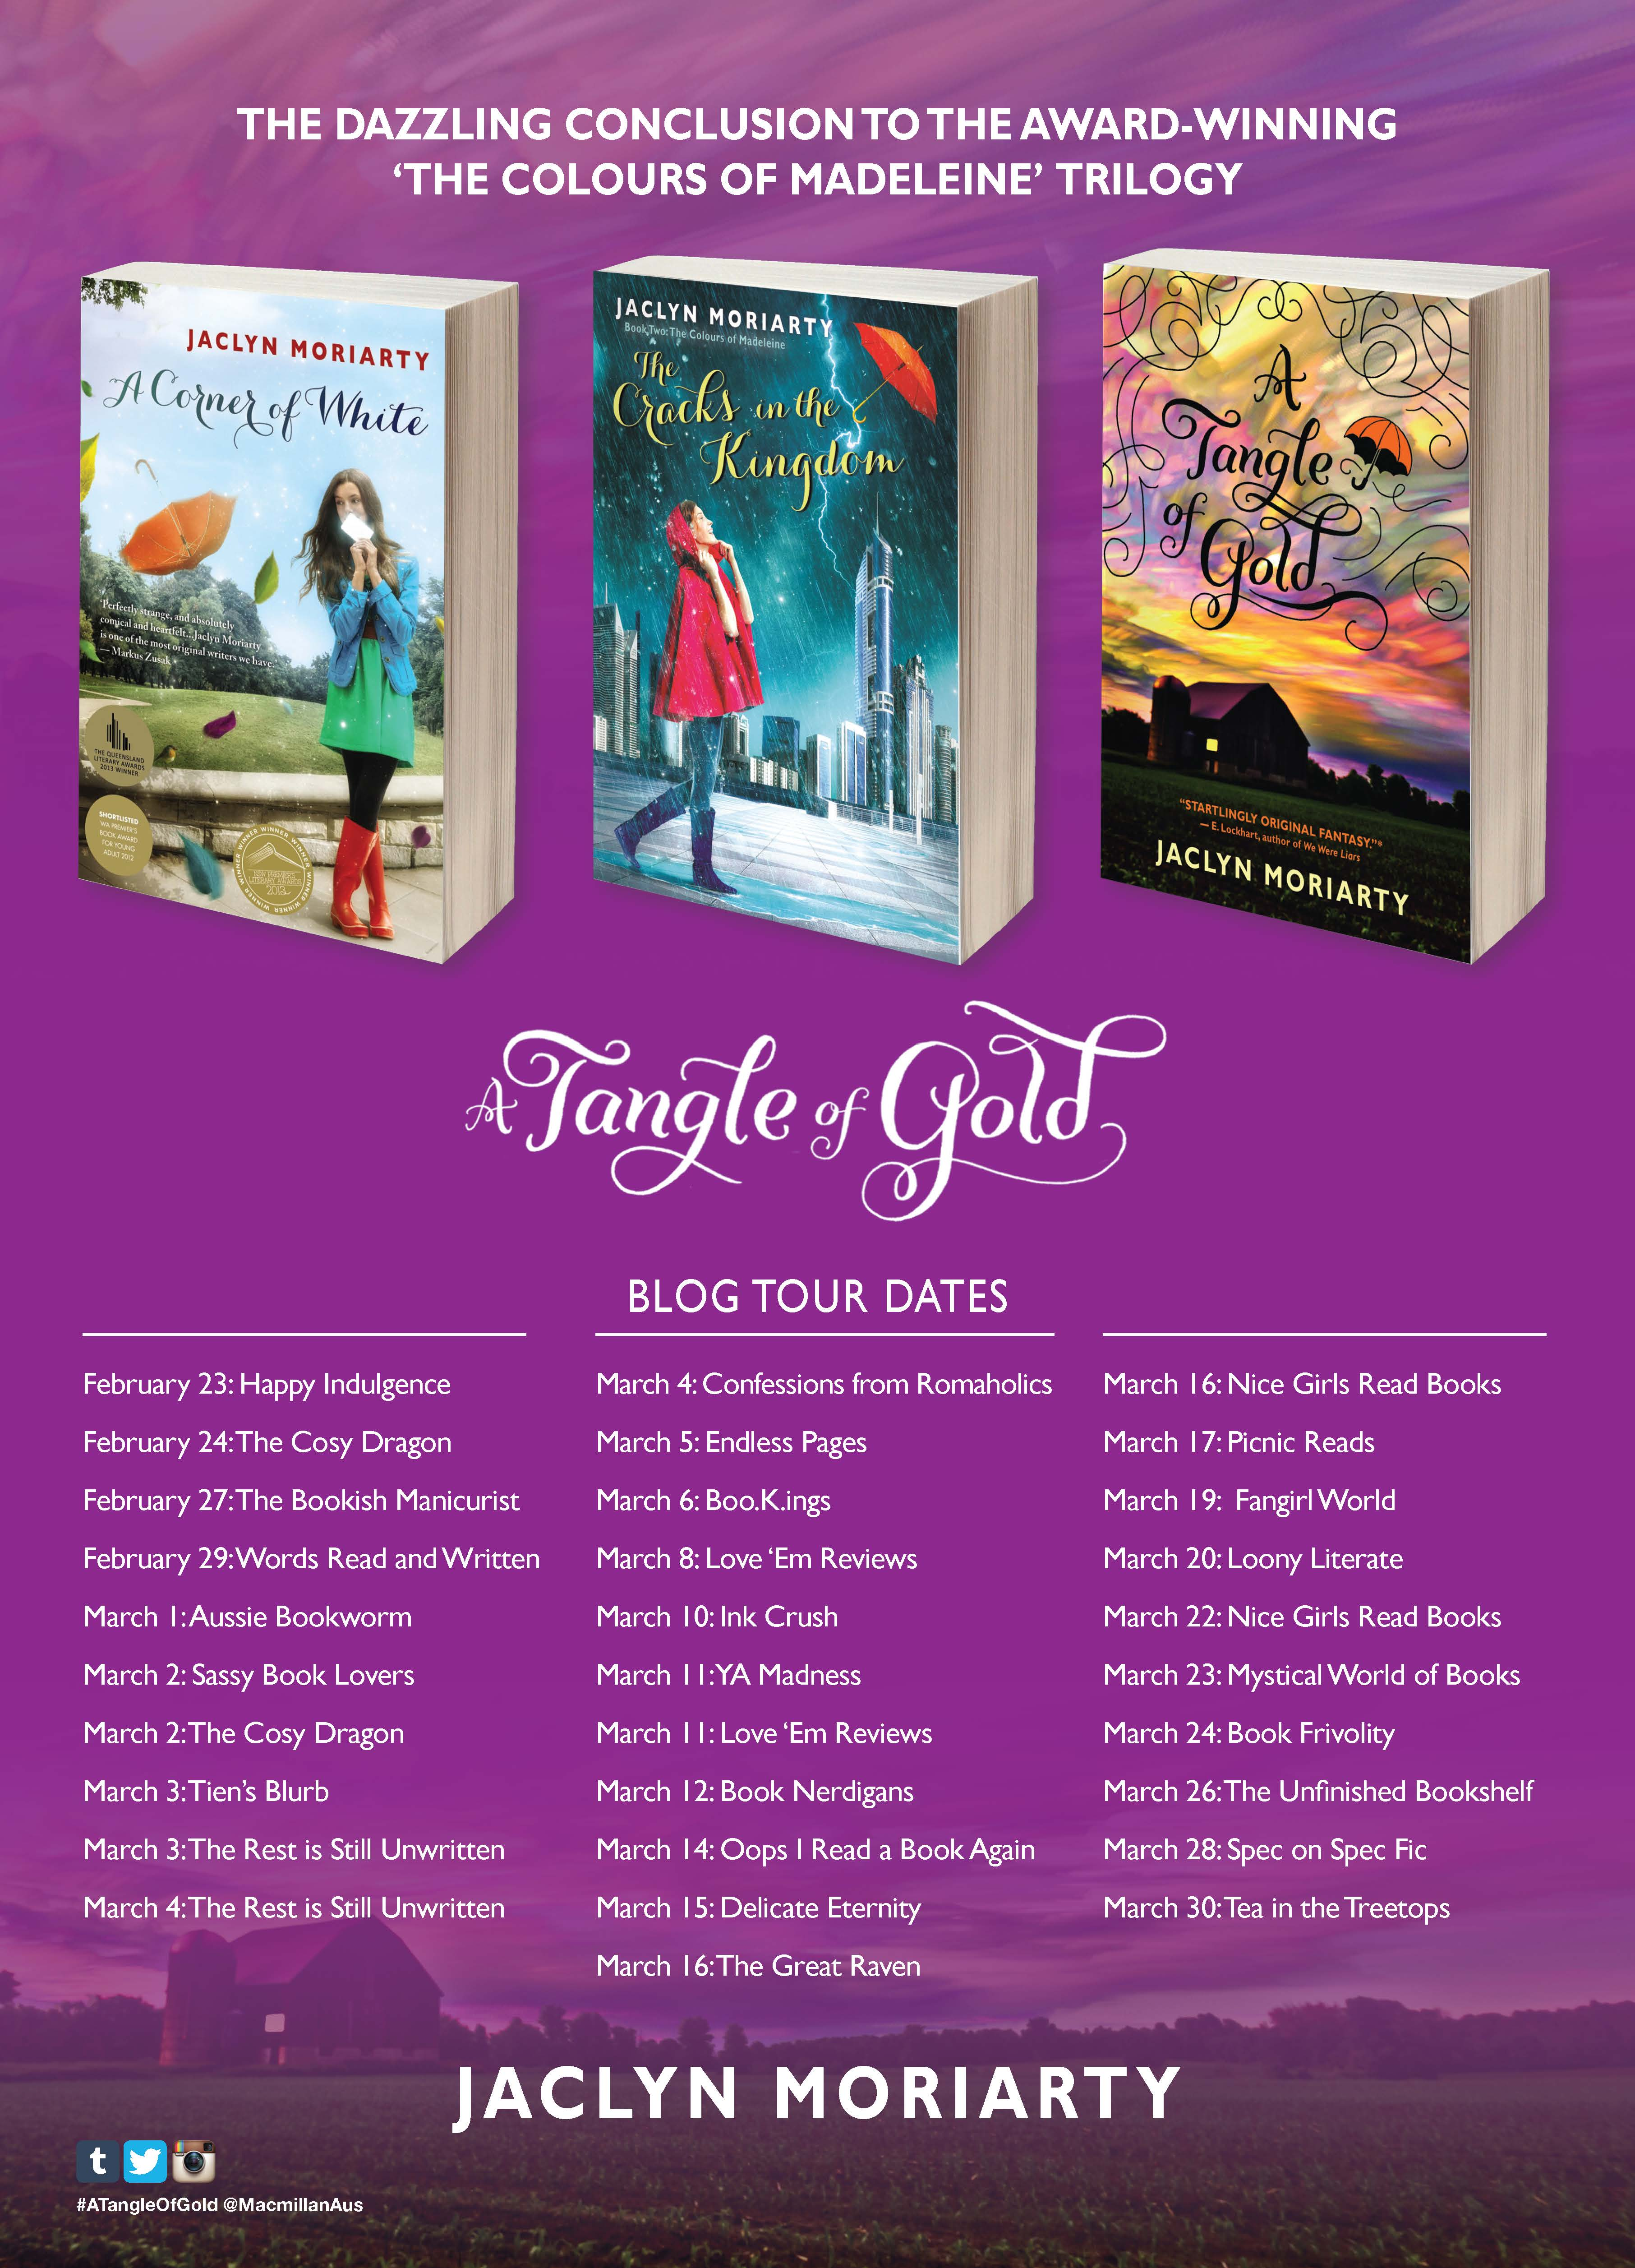 A Tangle of Gold_Blog_Tour_Dates_160404